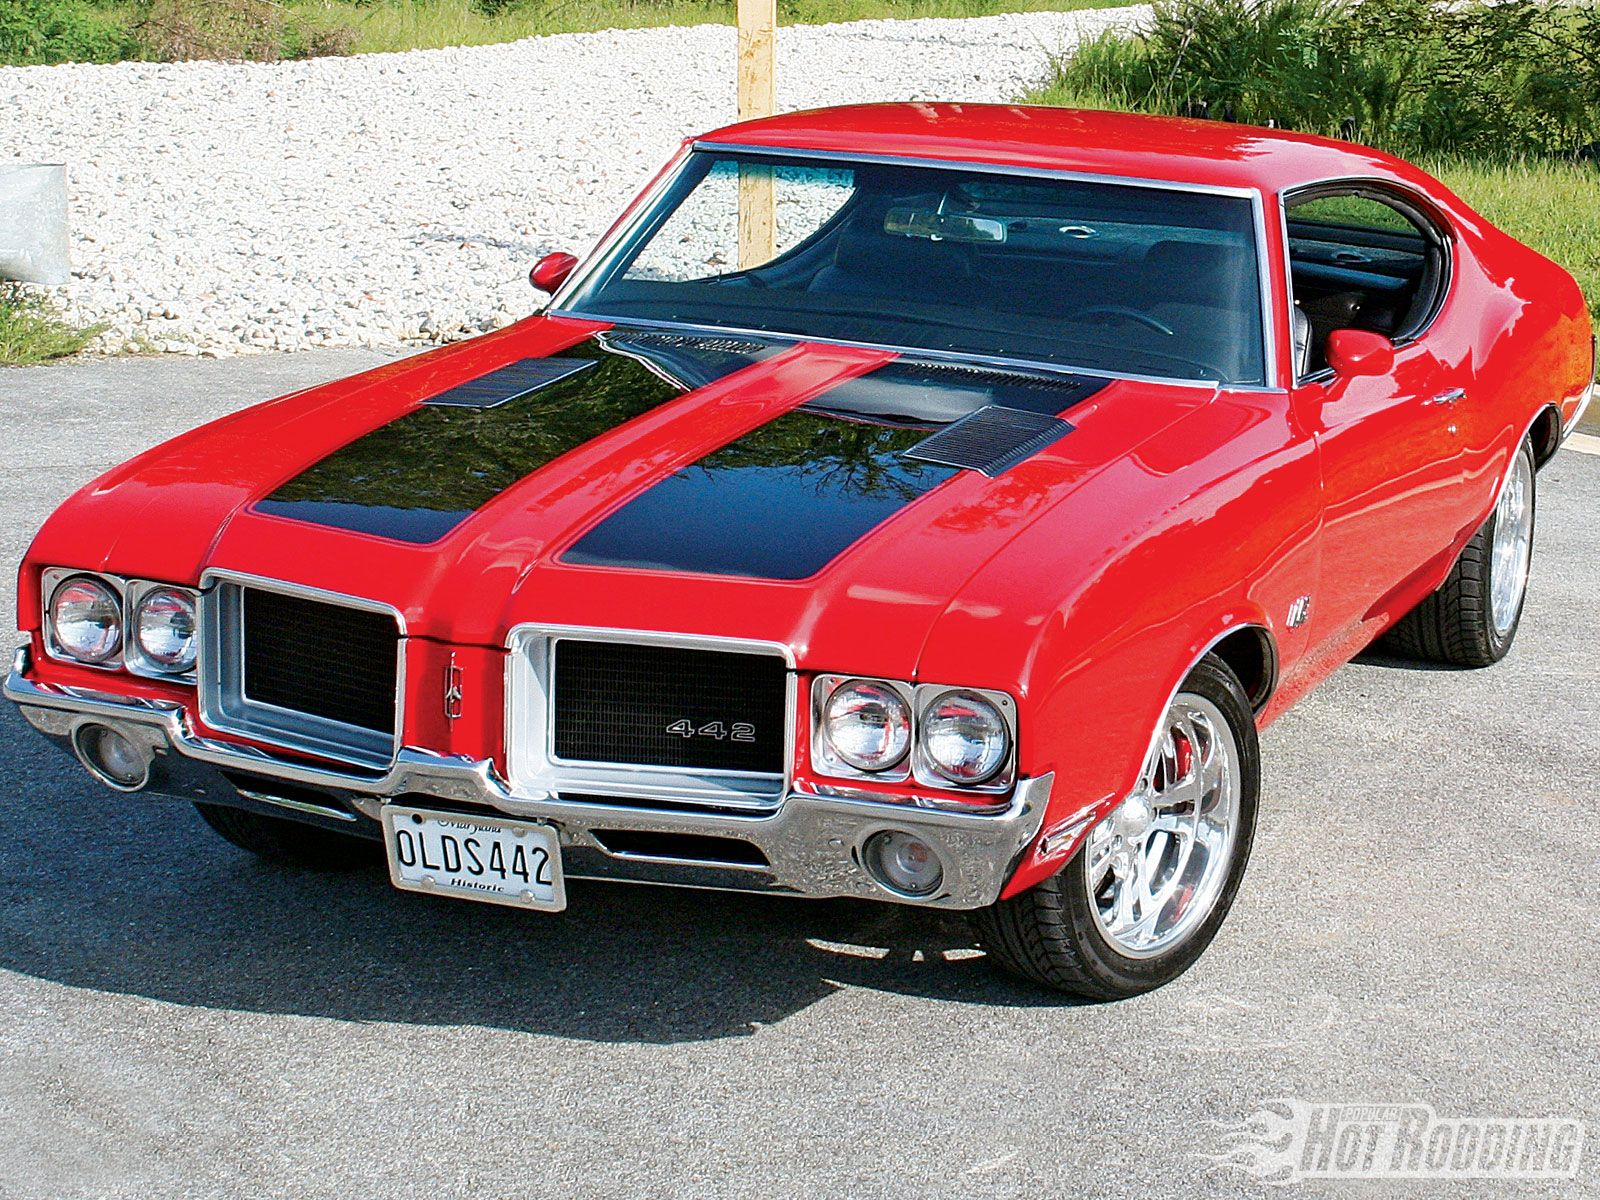 1969 Oldsmobile 442 Red